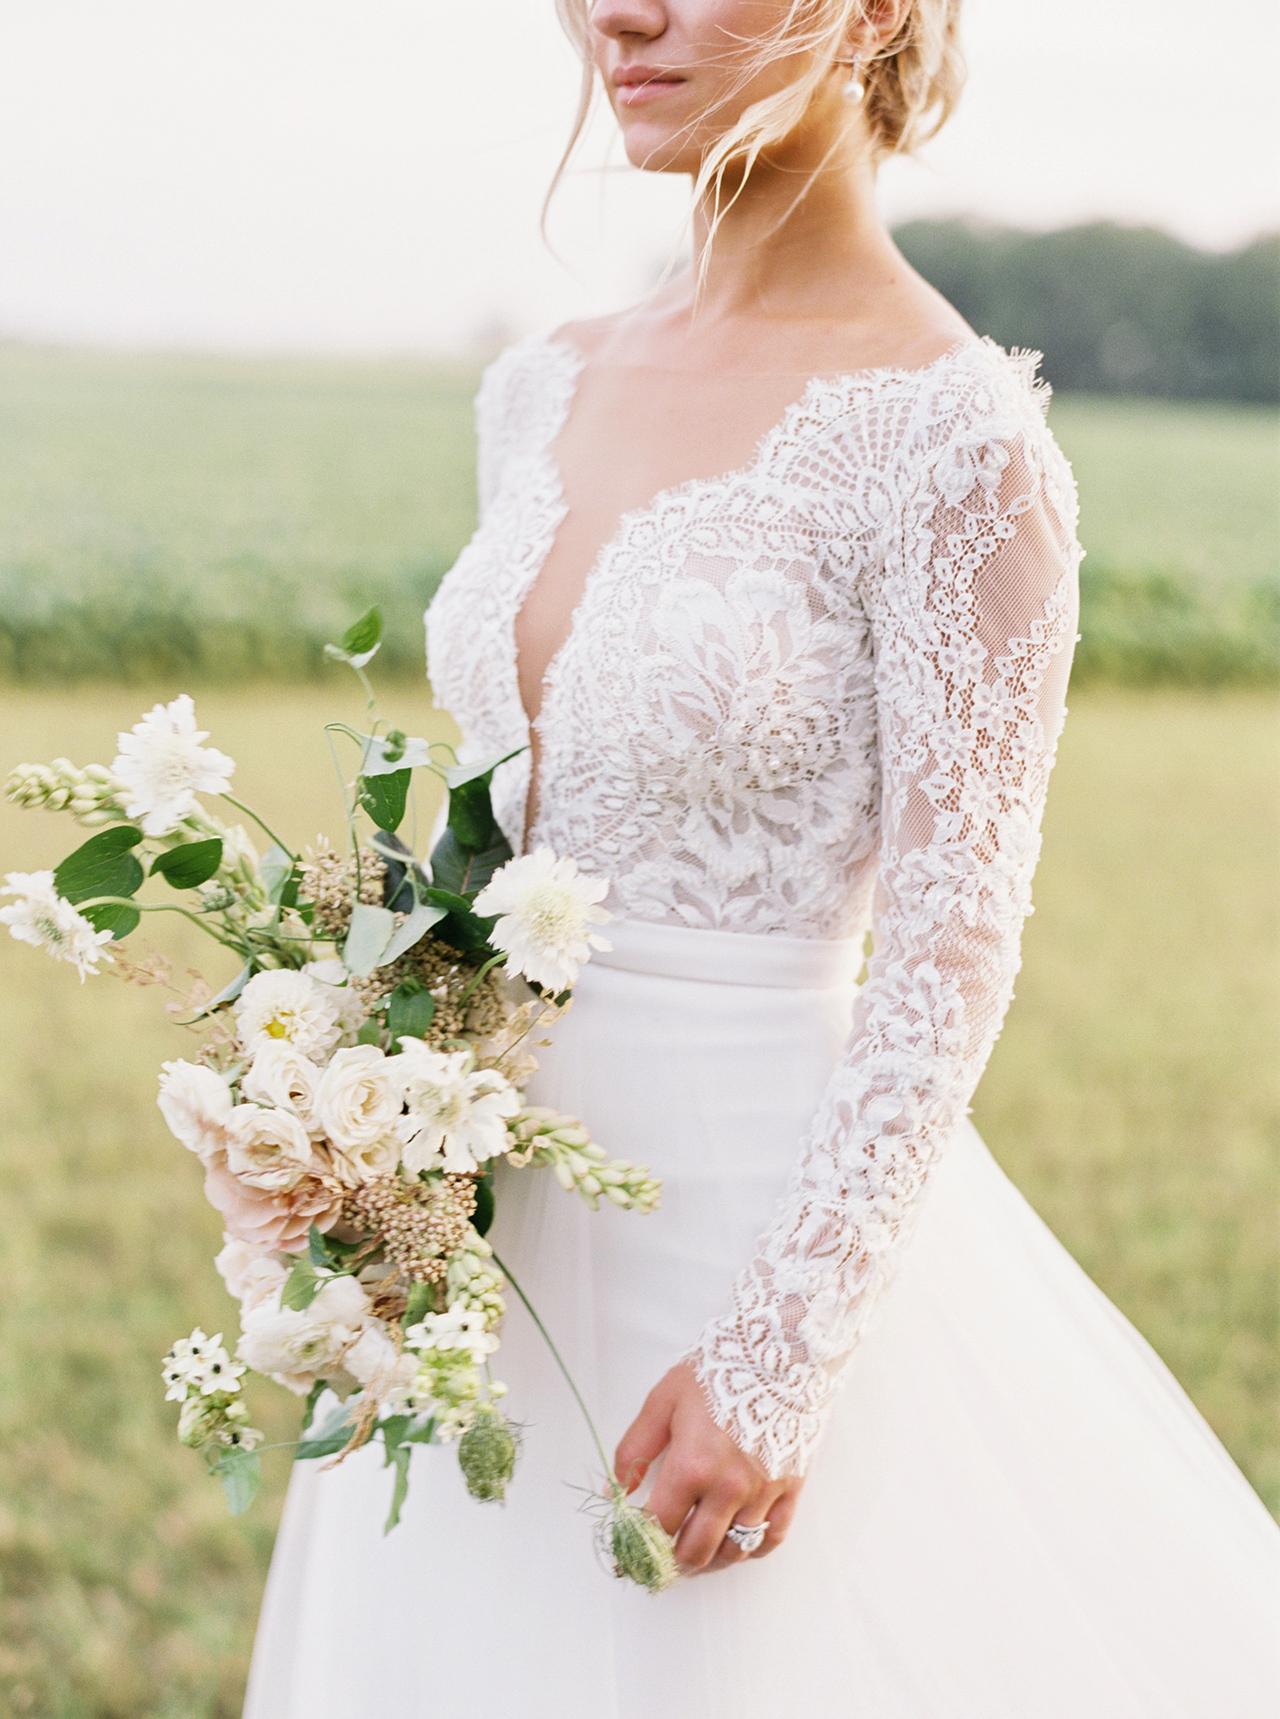 v-nick long sleeve wedding dress white boquet